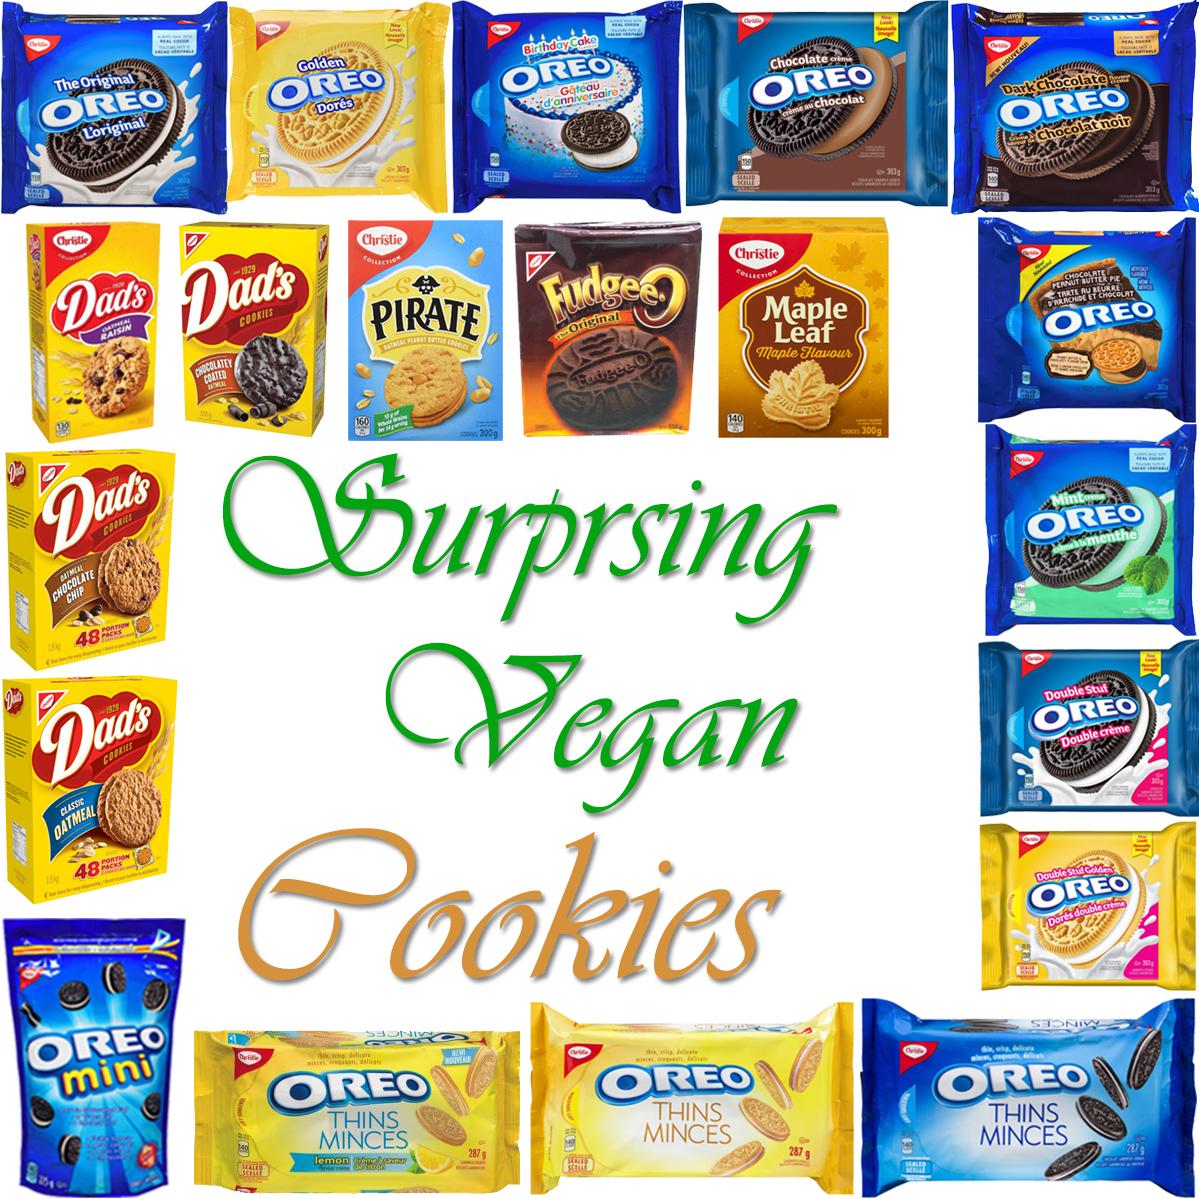 AterImber.com - The Veg Life - Vegan Tips - Surprising Vegan Series - Surprising Vegan Cookies - vegan food, vegan snacks, cookies, Oreos, Dad's cookies, Pirate cookies, Fudgee-Os, Maple Cookies, Mr. Christie Cookies, food blogger